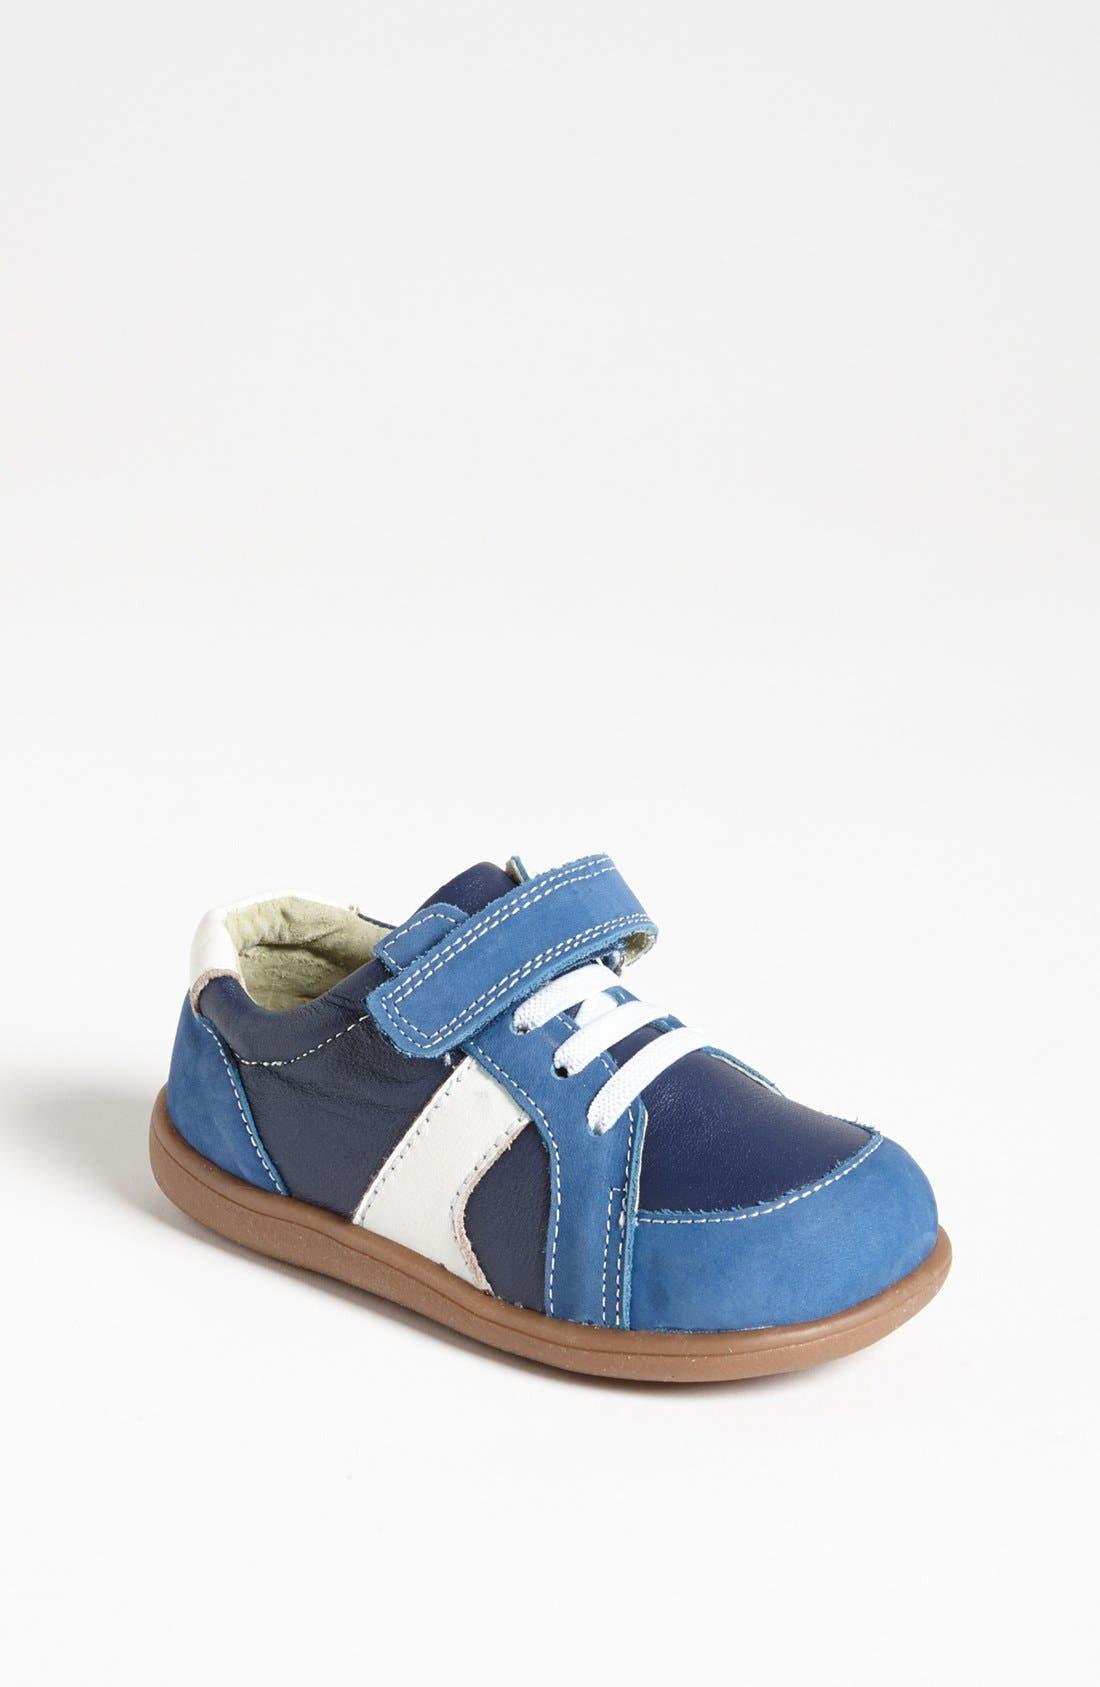 Alternate Image 1 Selected - See Kai Run 'Connor' Sneaker (Baby, Walker & Toddler)